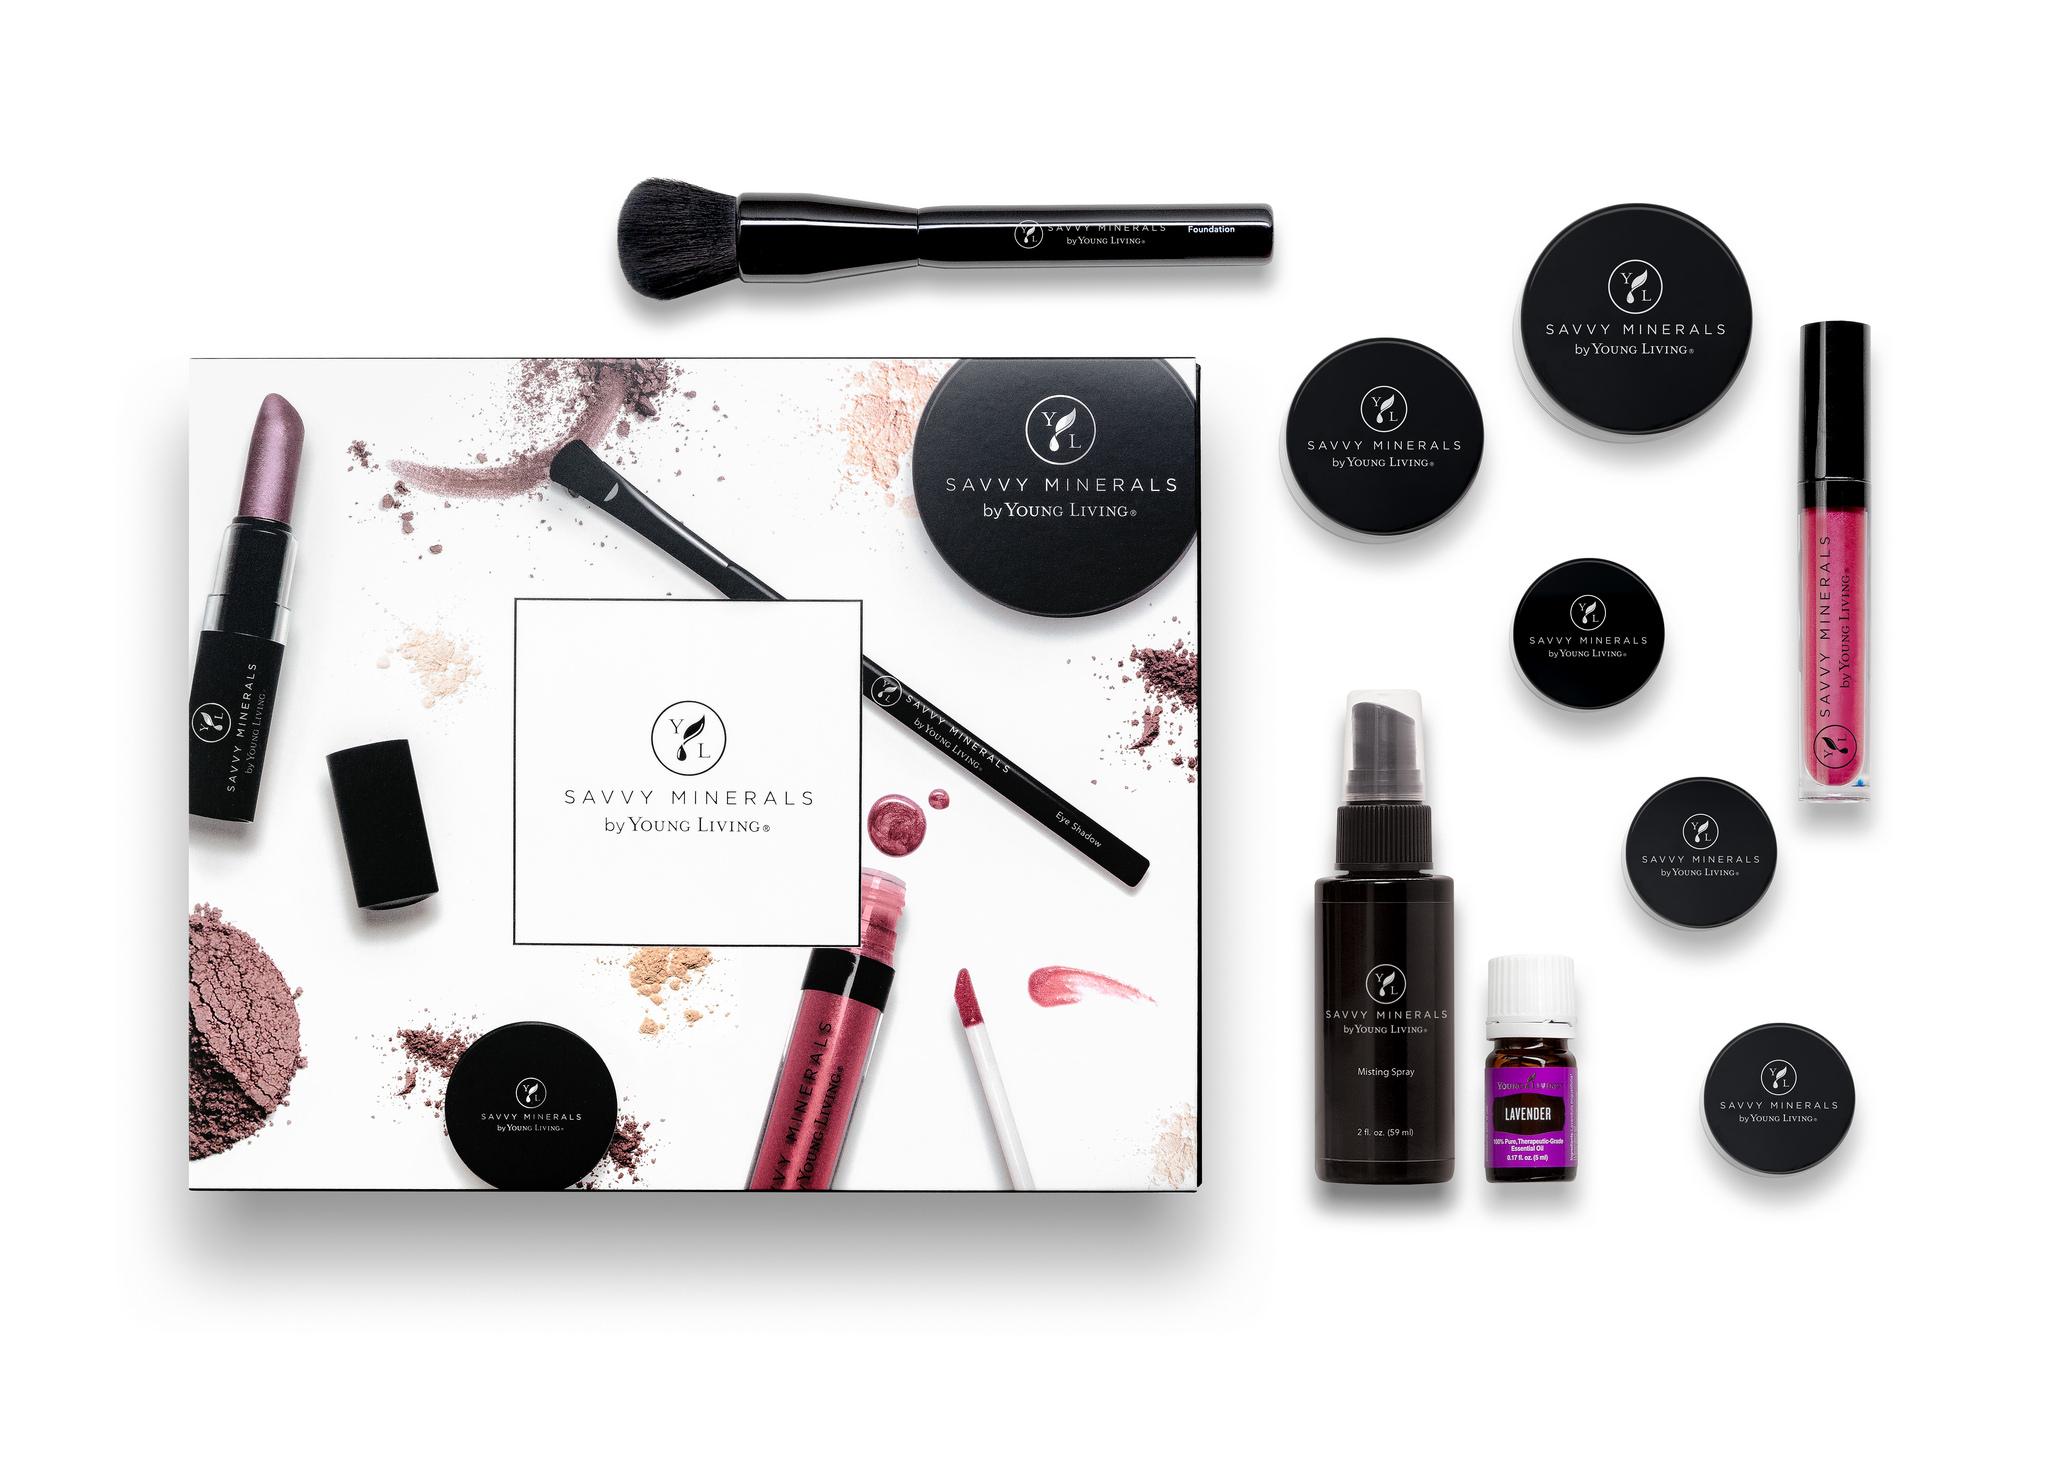 Savvy Minerals Makeup Set